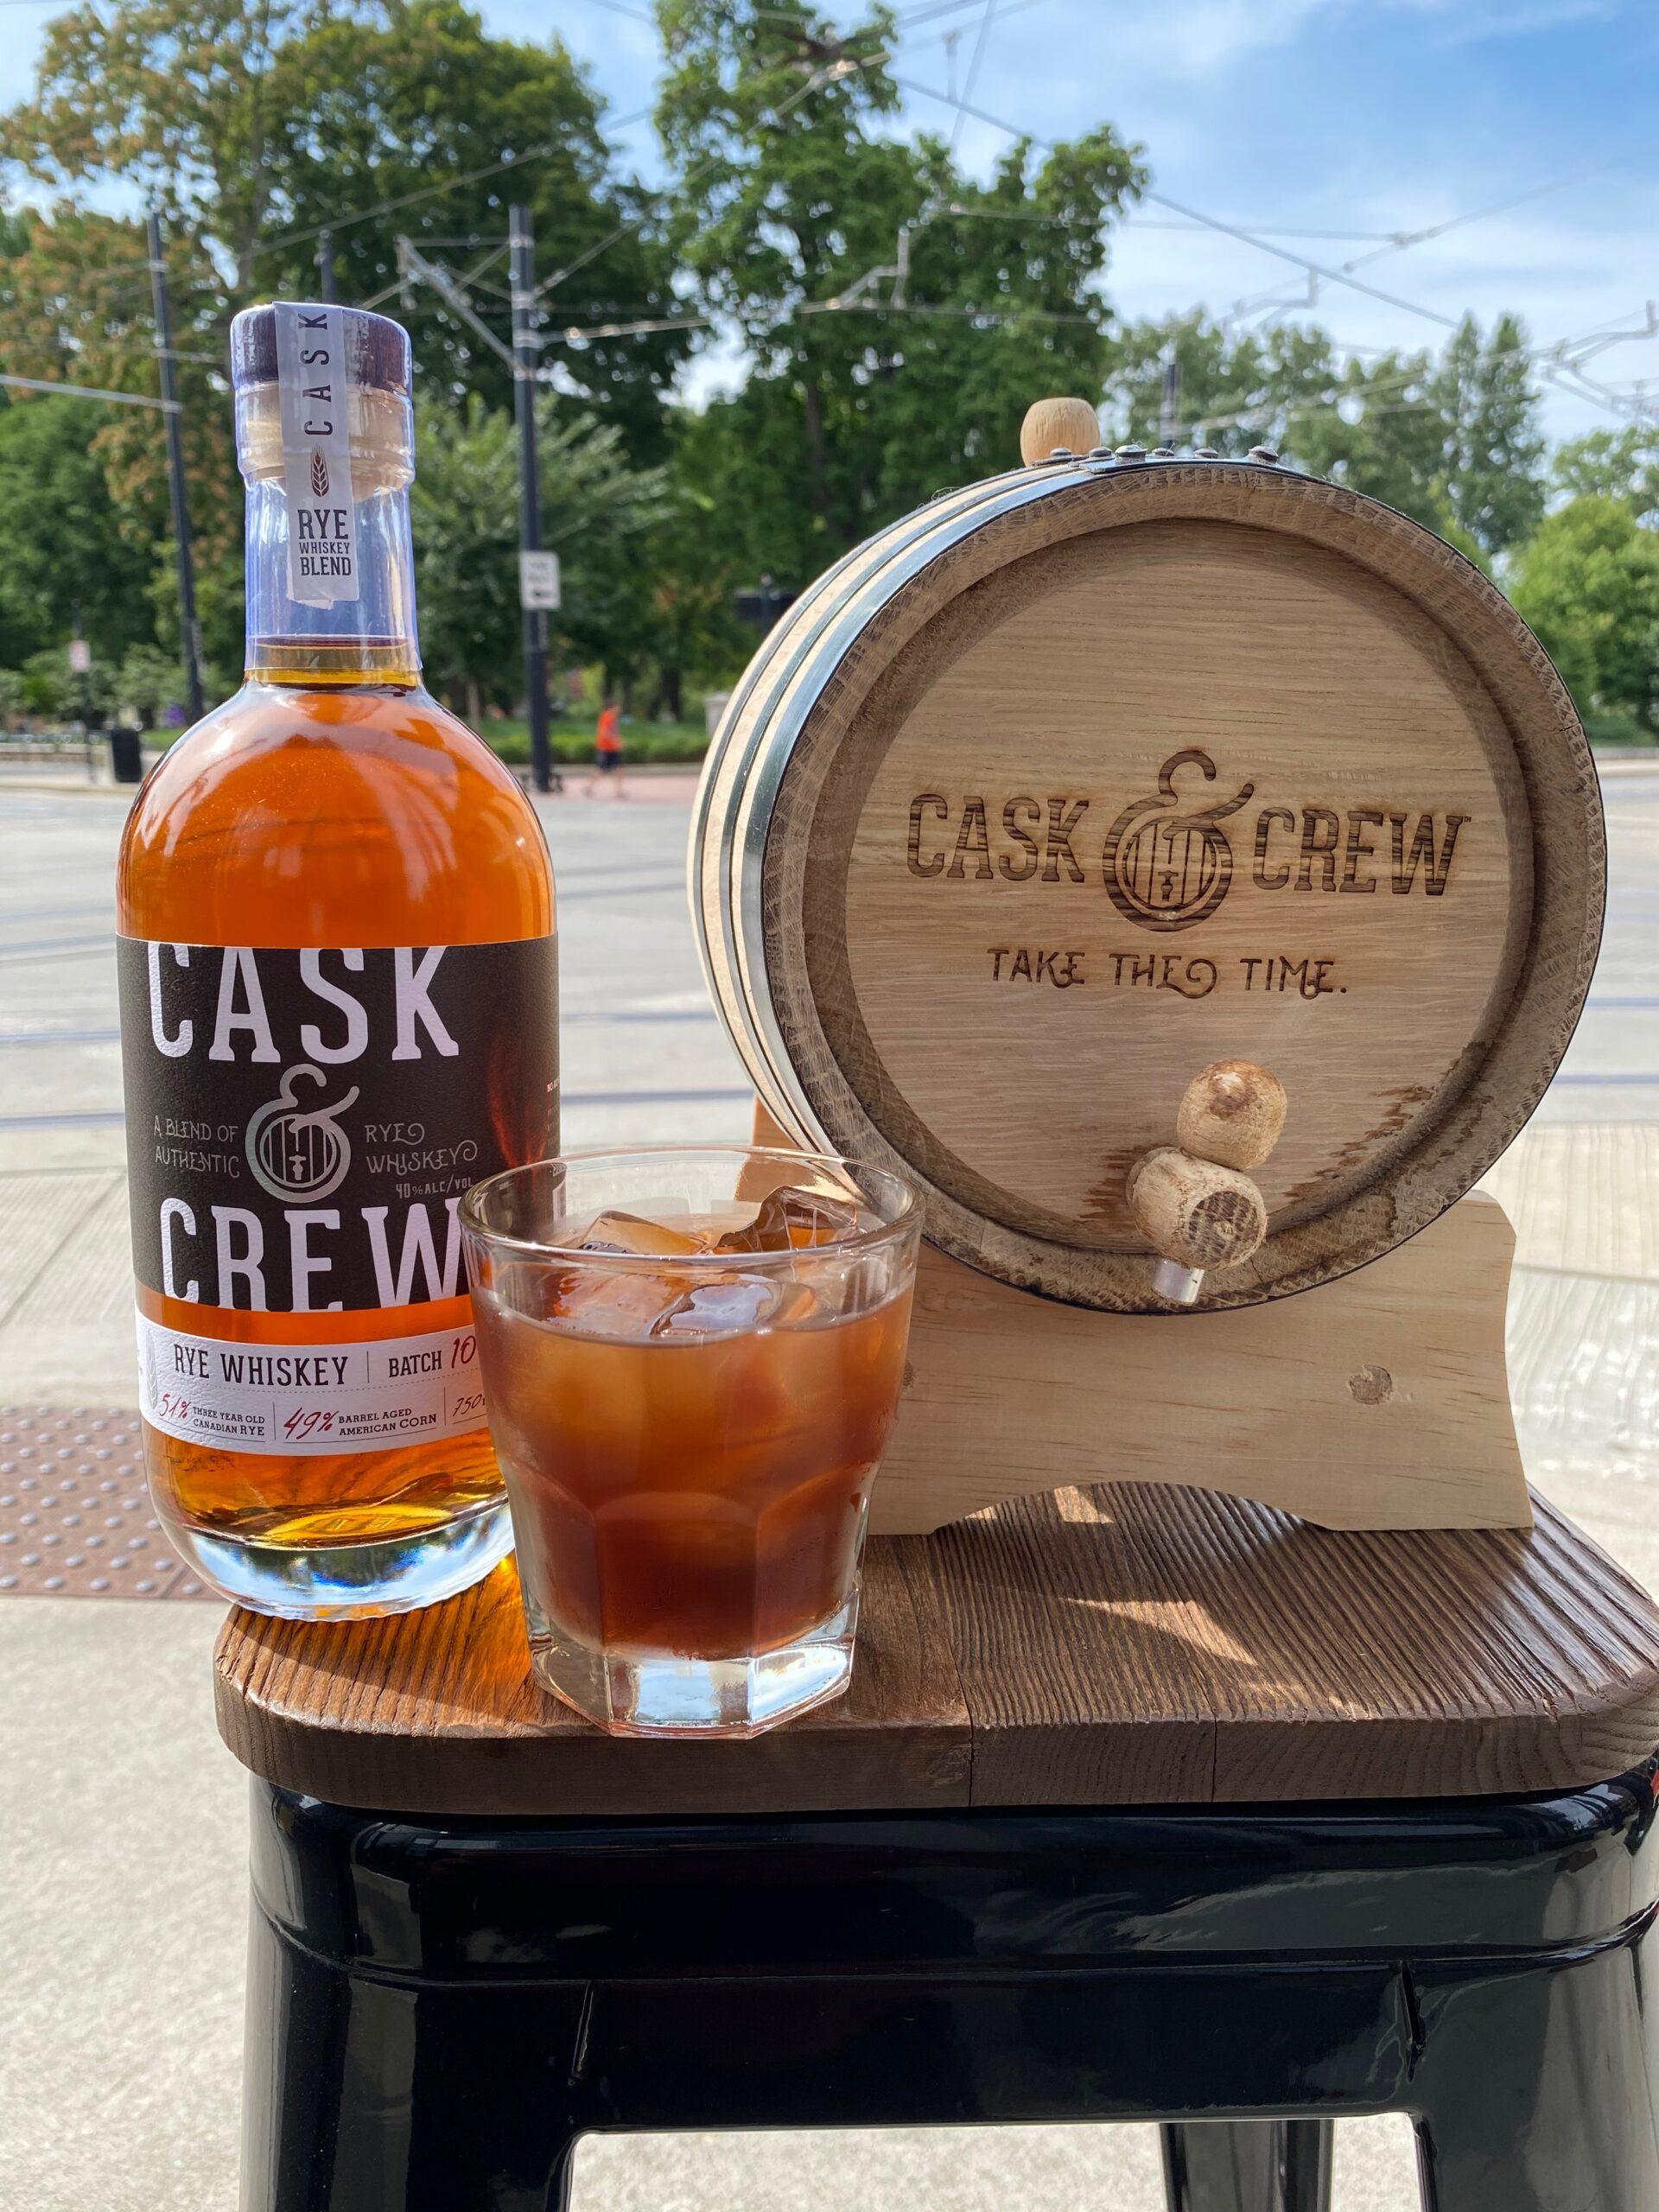 New! Cask & Crew Barrel Aged Manhattan